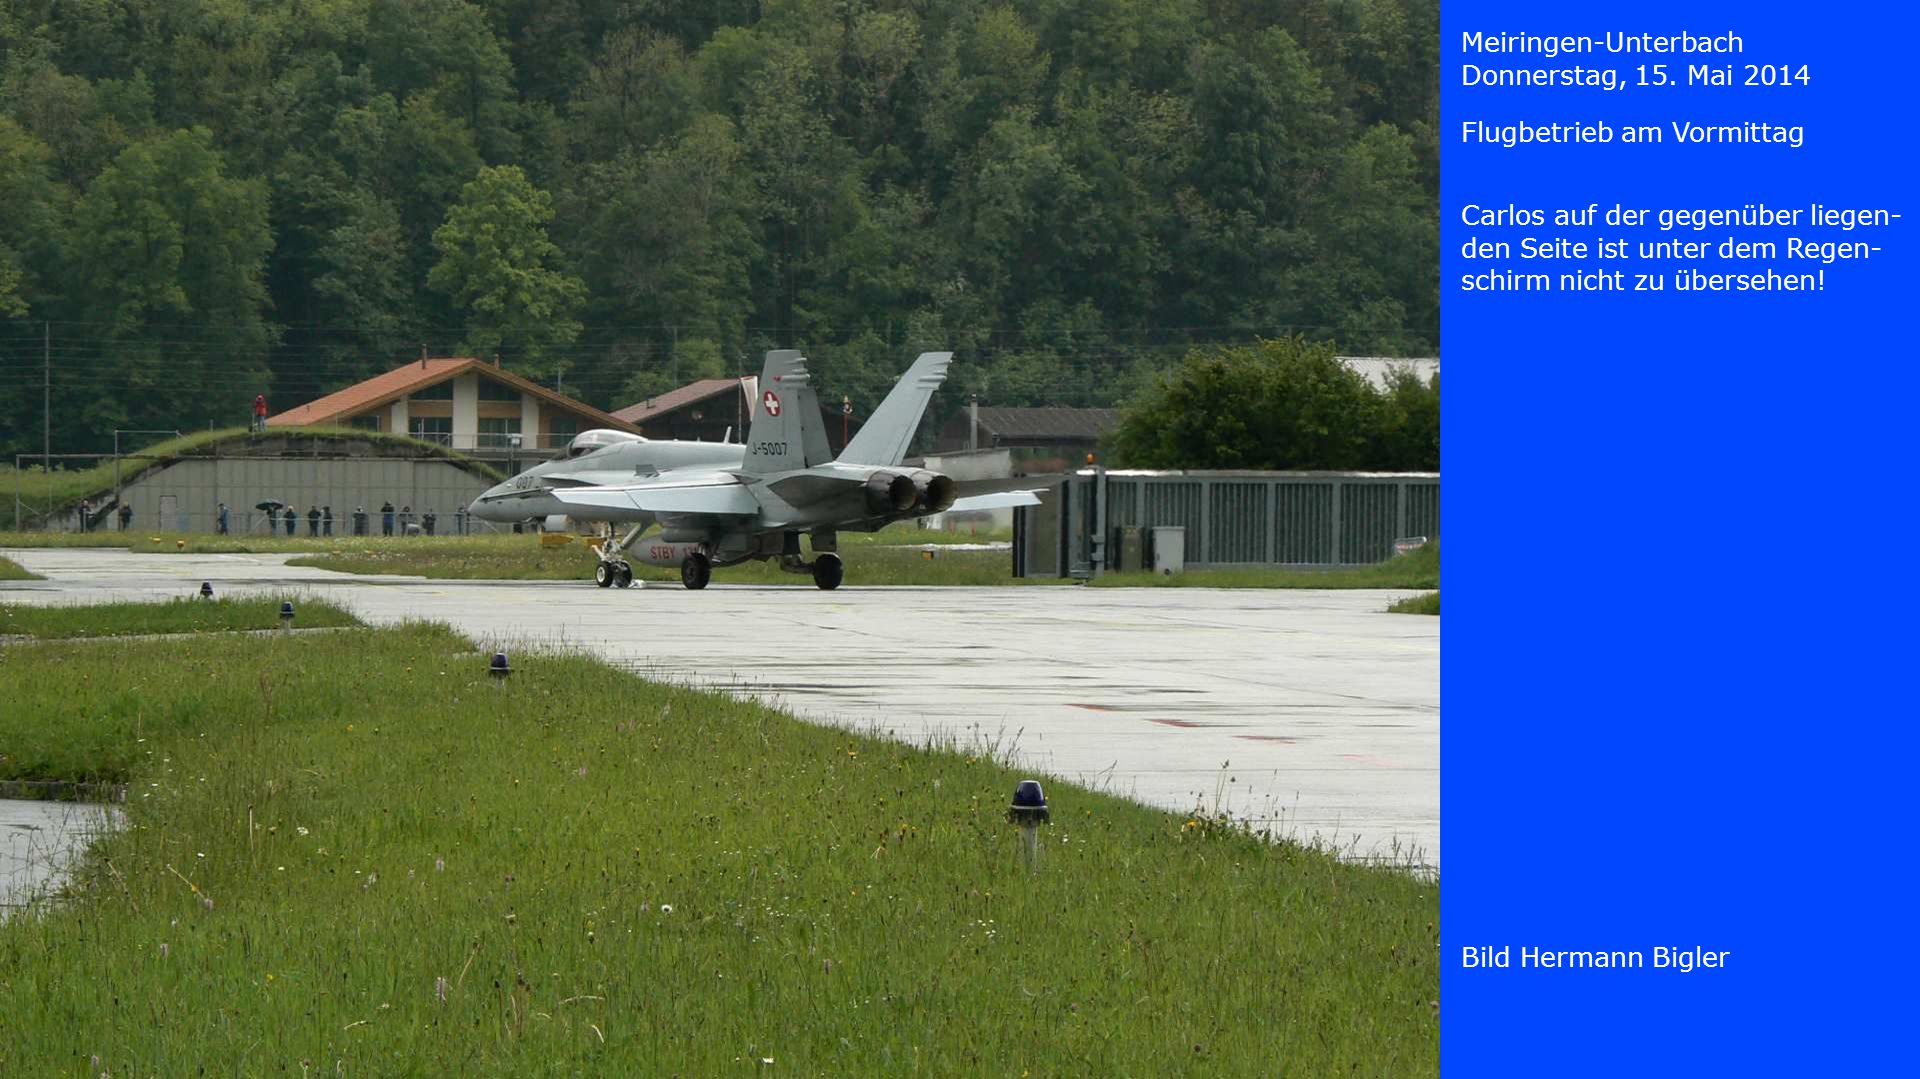 Meiringen-Unterbach Donnerstag, 15. Mai 2014. Flugbetrieb am Vormittag.